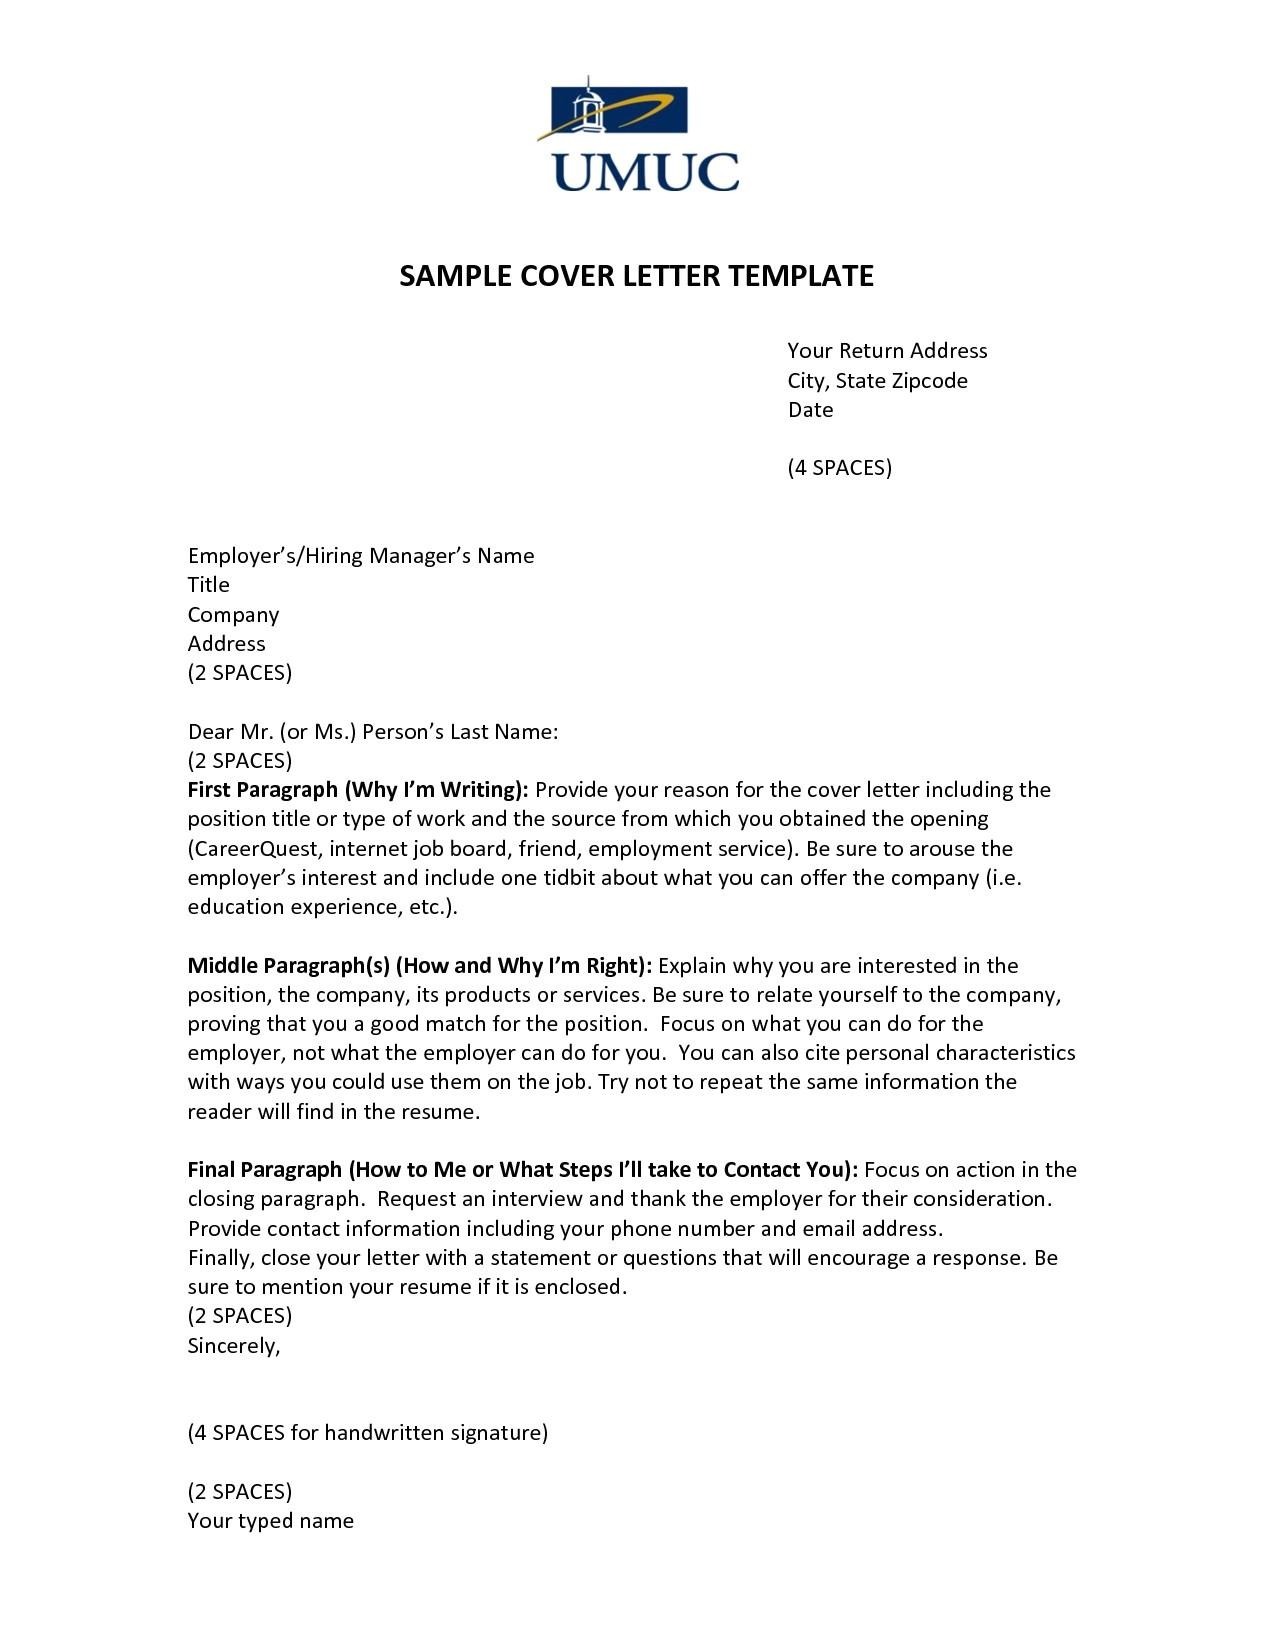 cover letter ending cover letter ending paragraph gallery cover letter sample